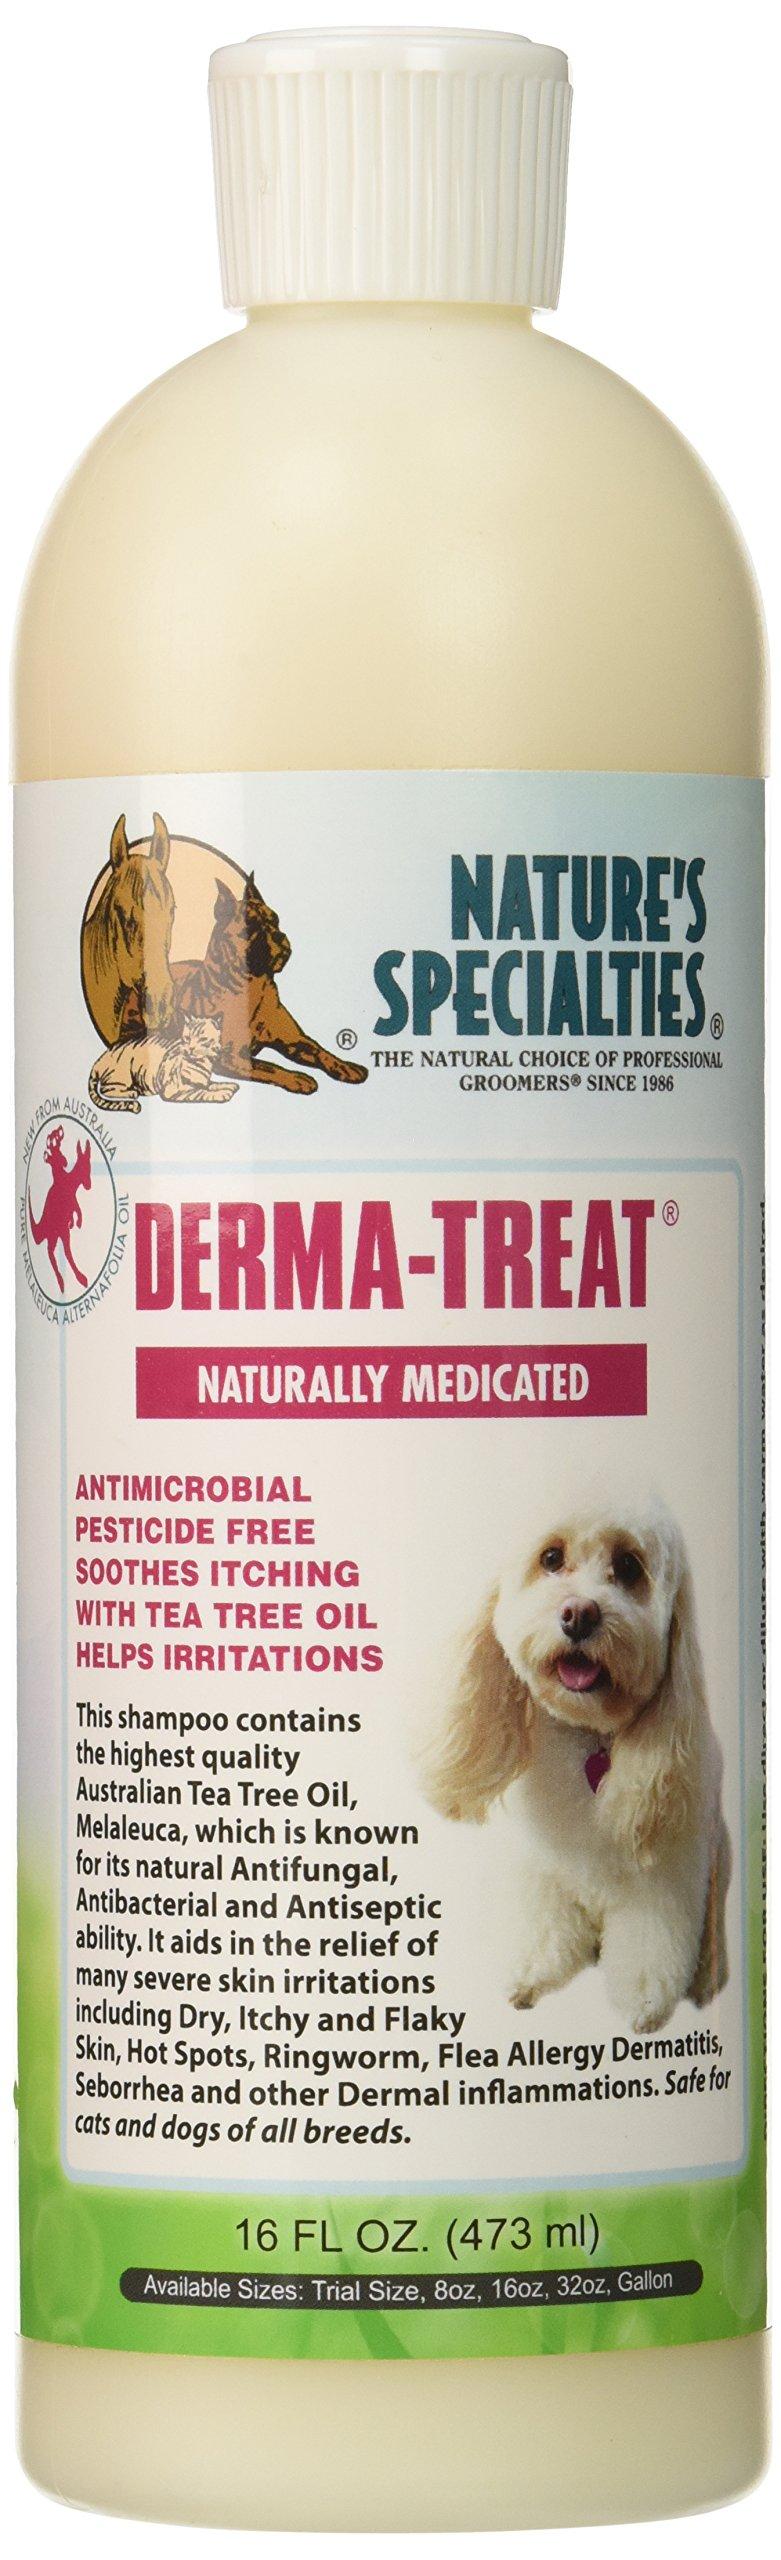 Nature's Specialties Derma Treat Pet Shampoo, 16-Ounce